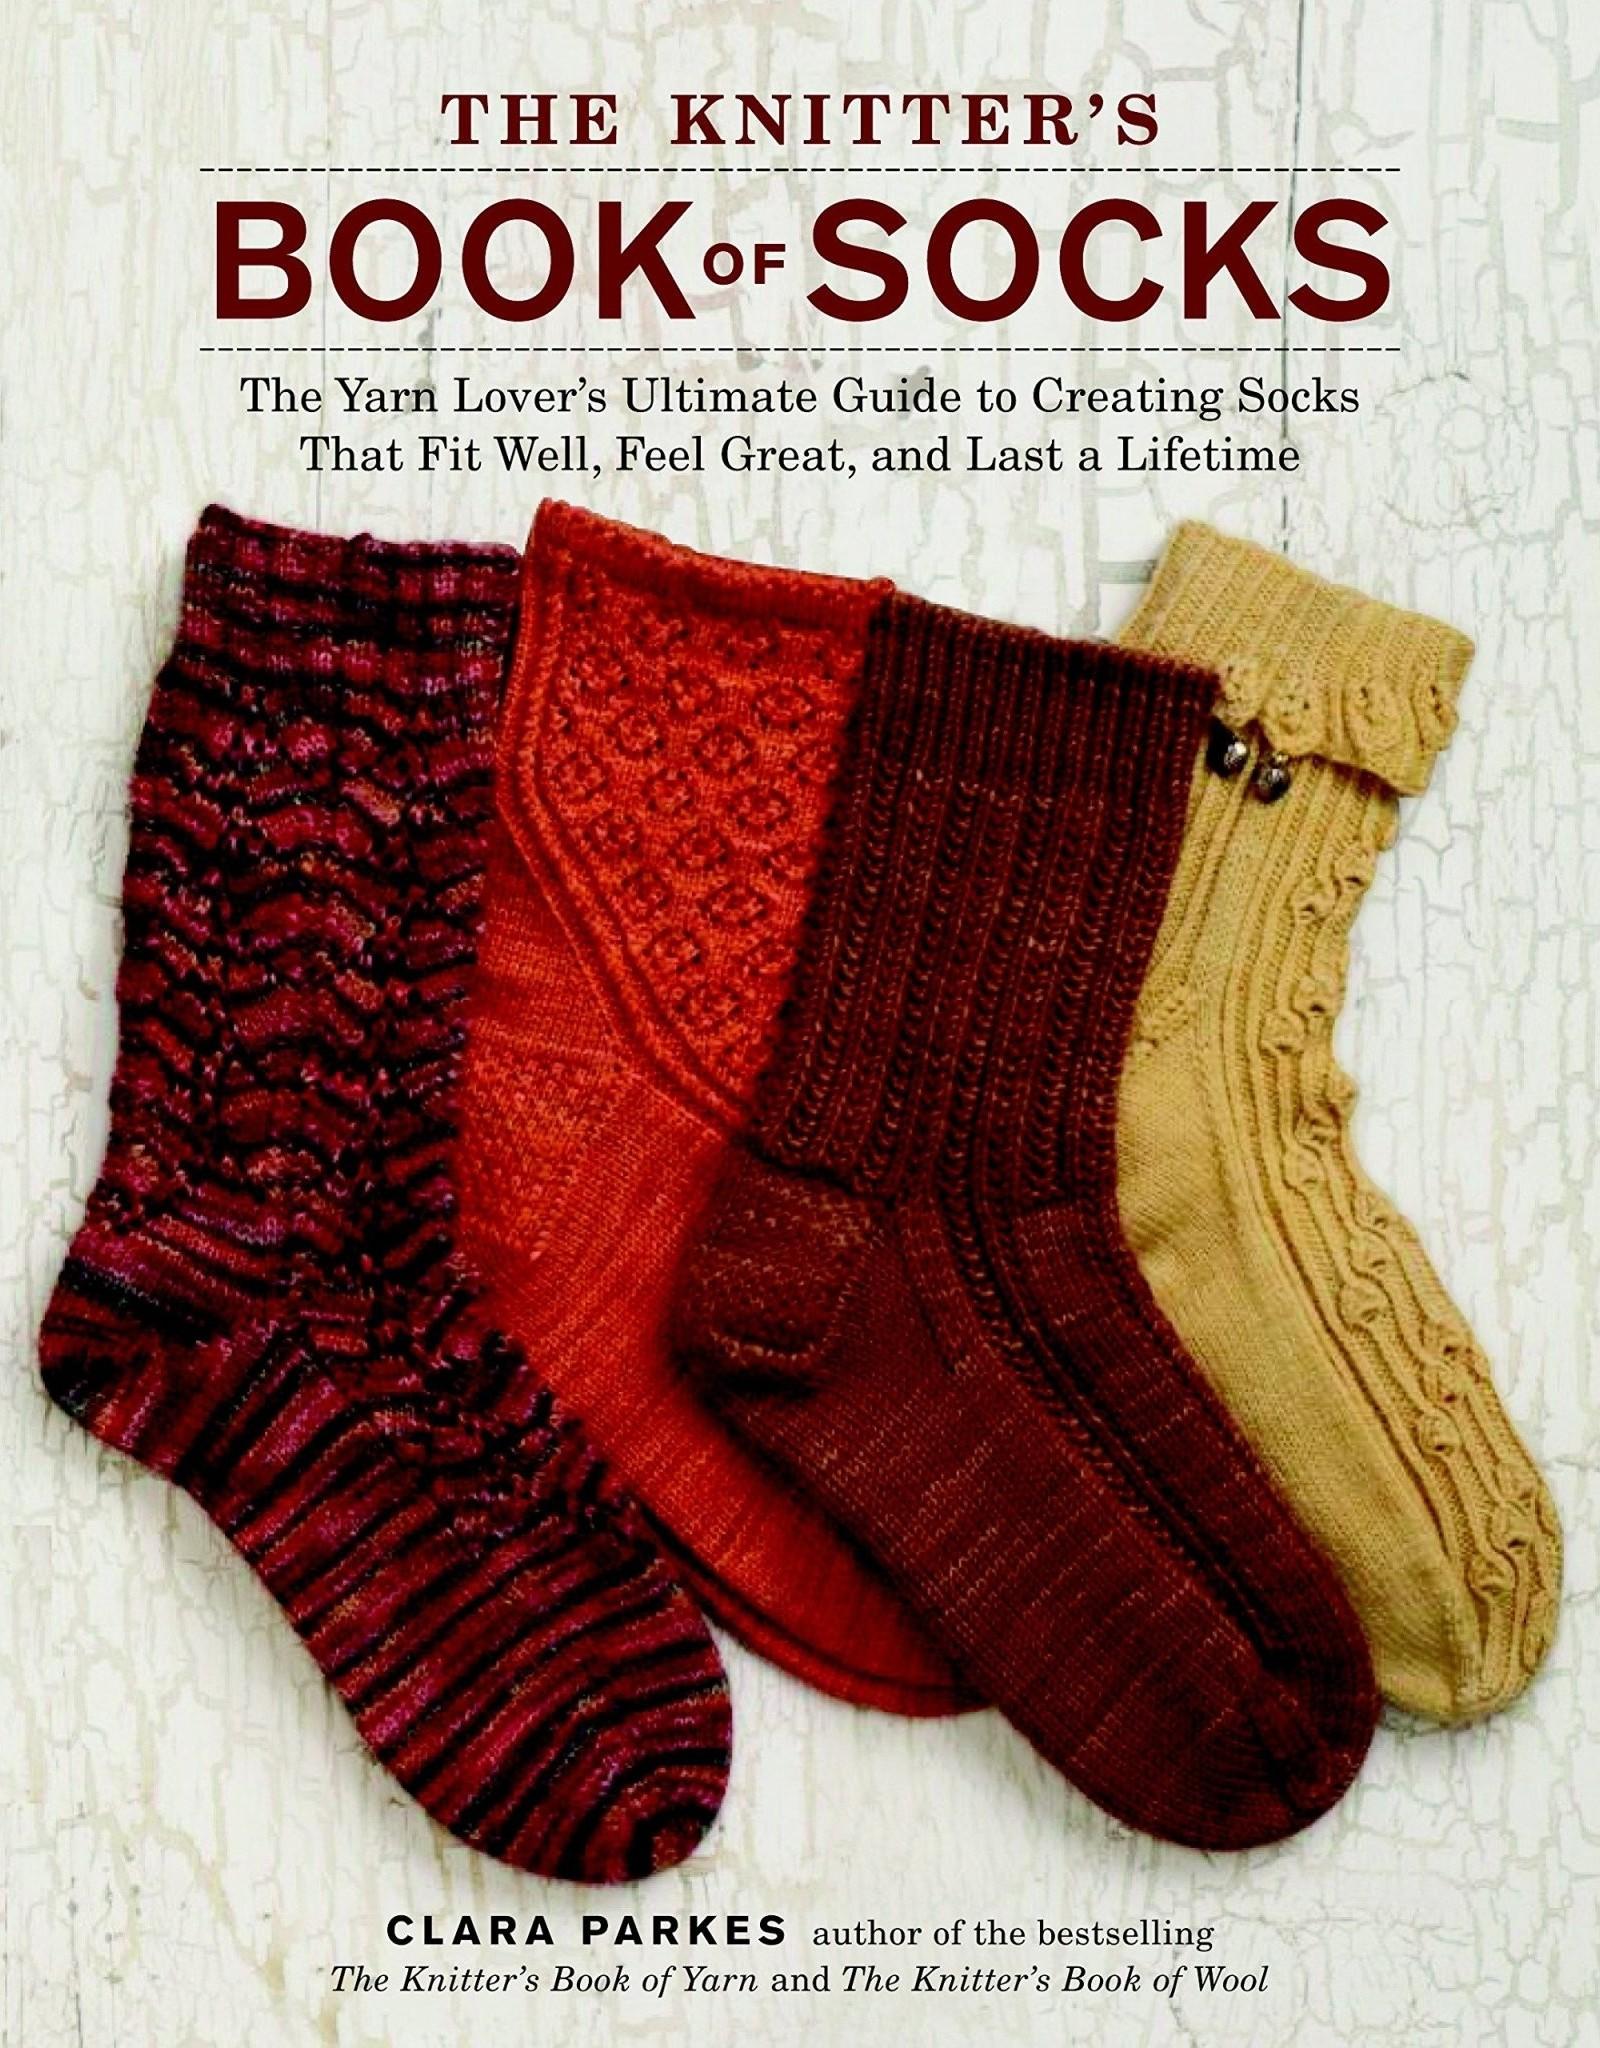 Potter Craft The Knitter's Book of Socks